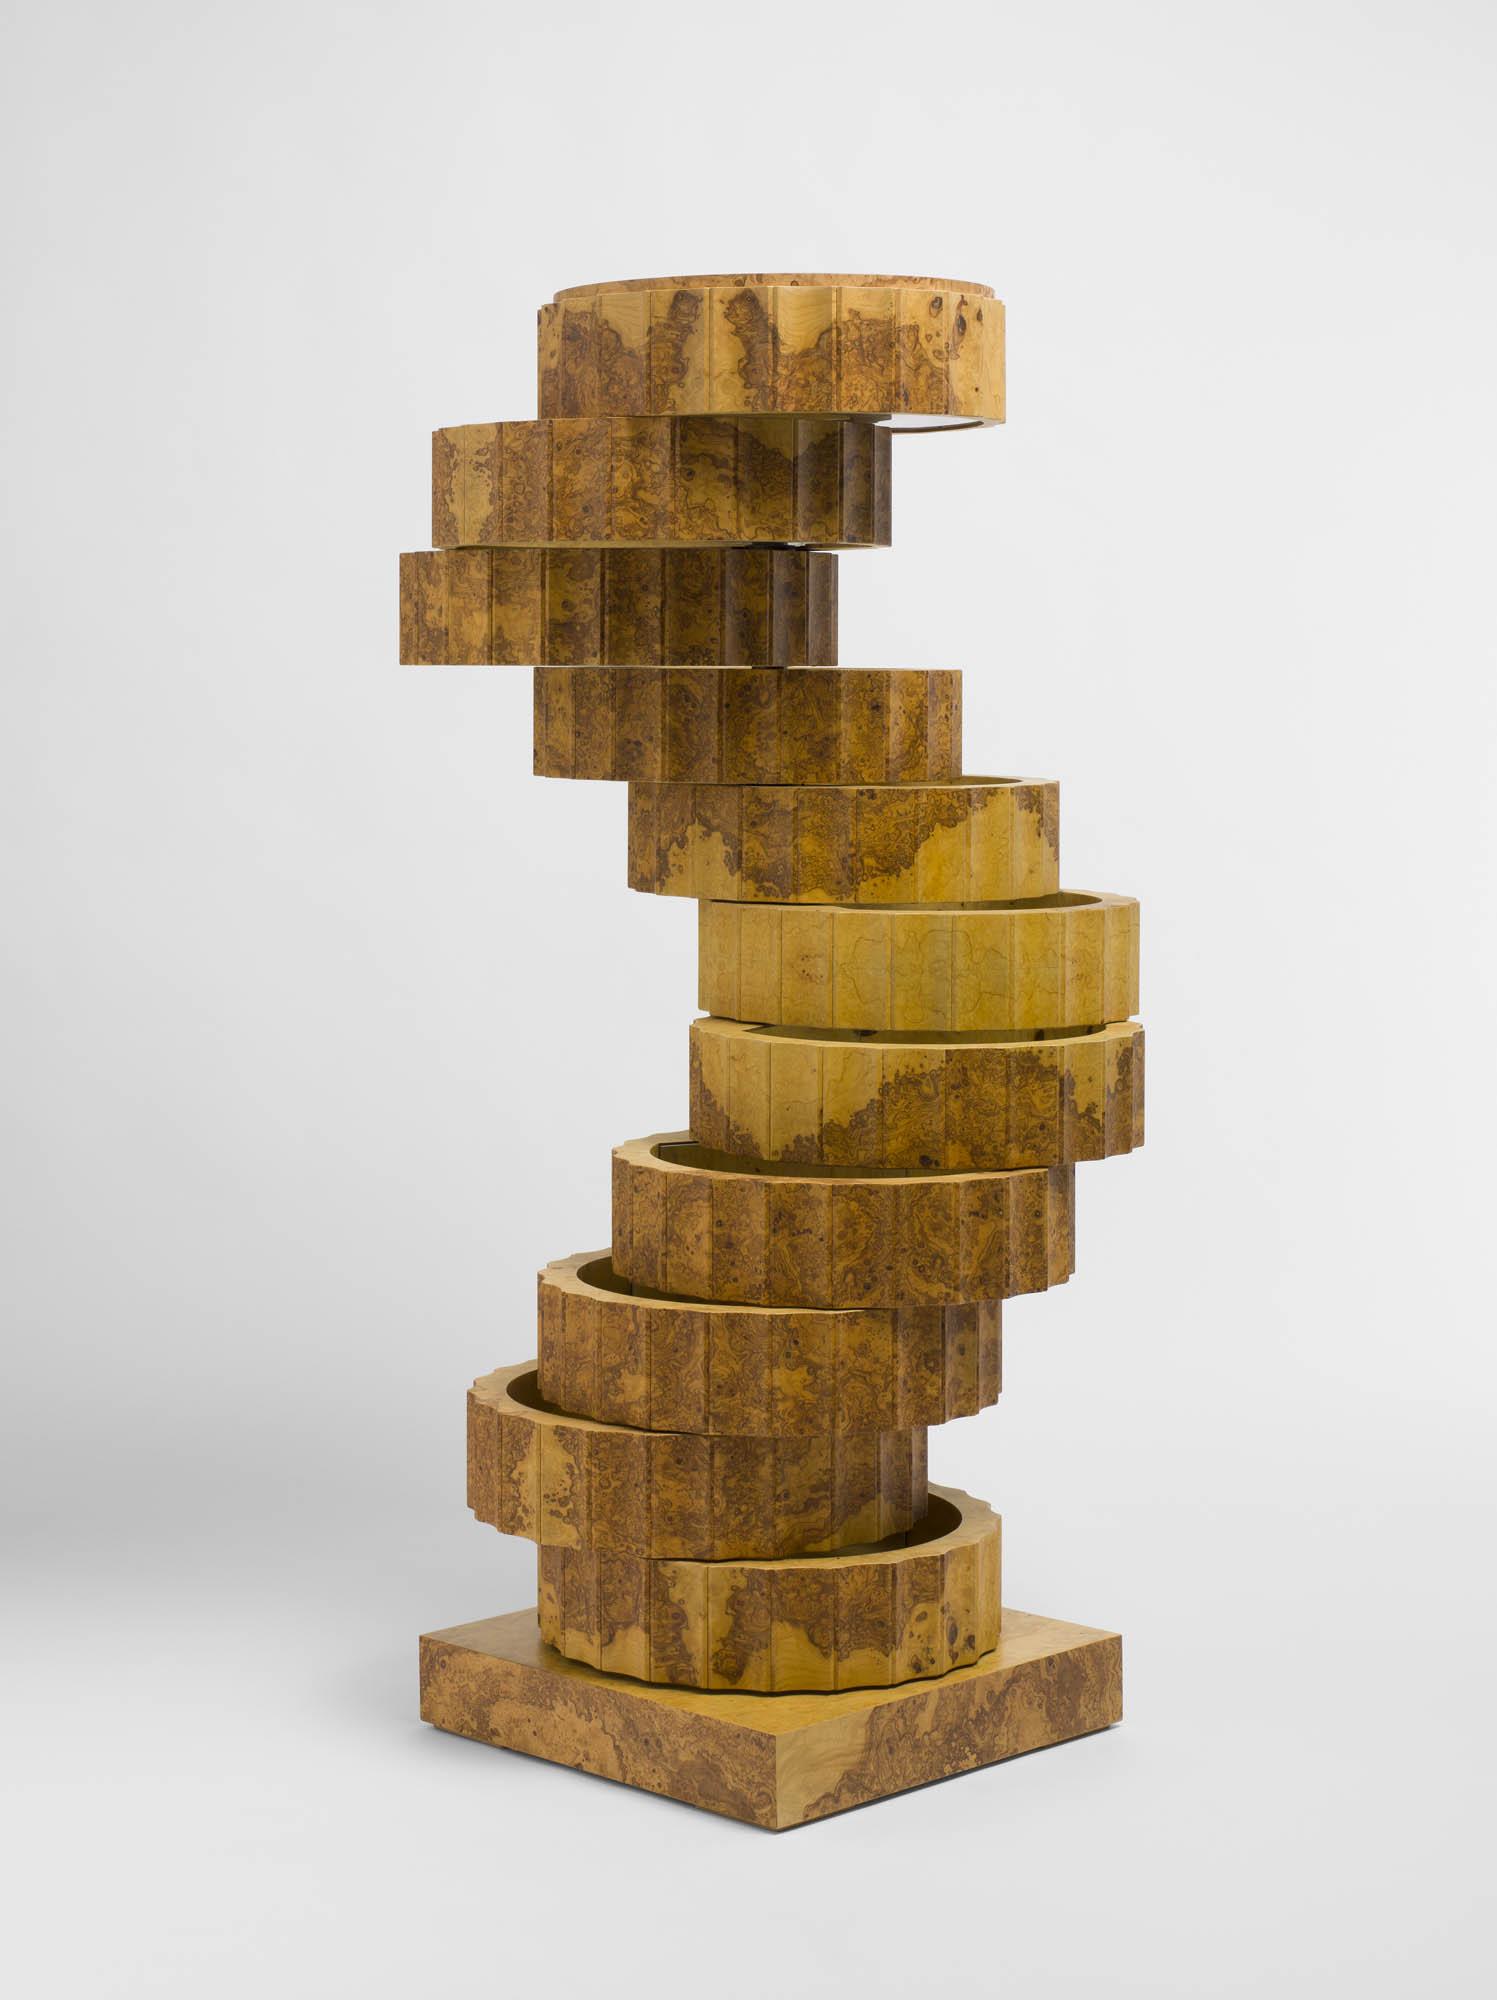 Säulenstumpf Robert Haussmann Trix Haussmann Behältermöbel